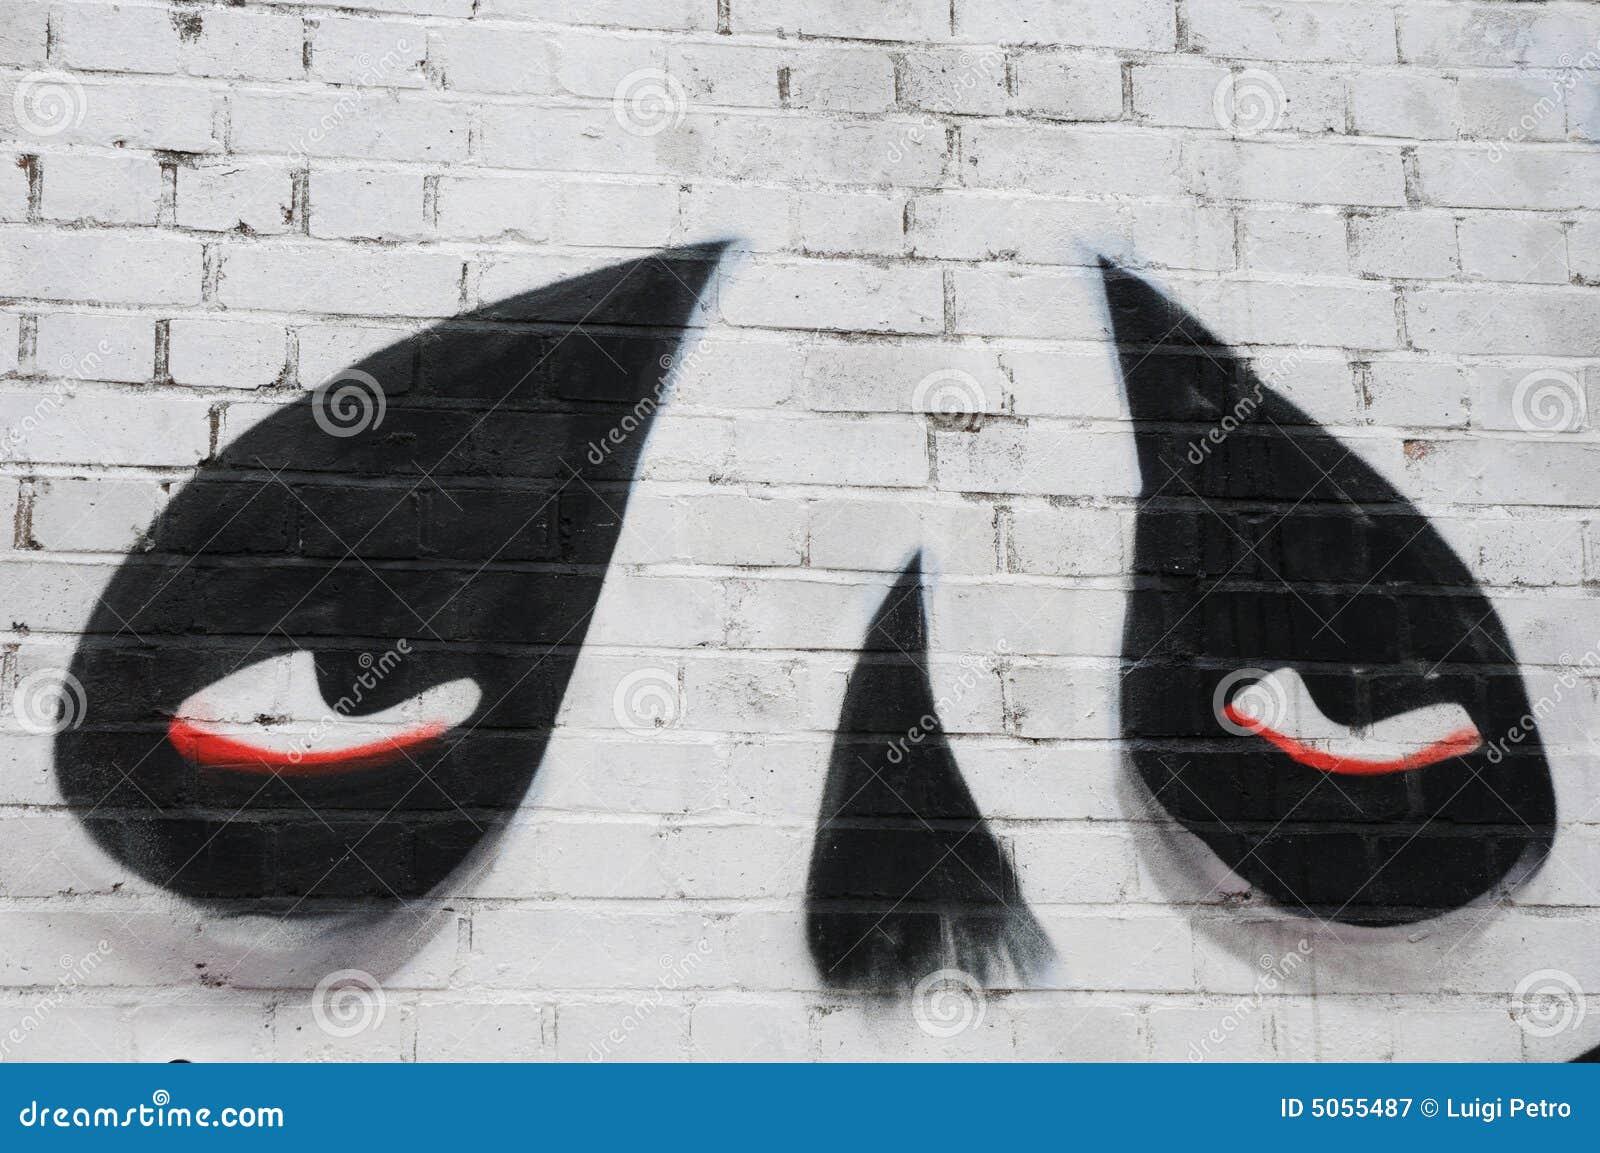 Graffiti dans la rue de Sclater, Londres